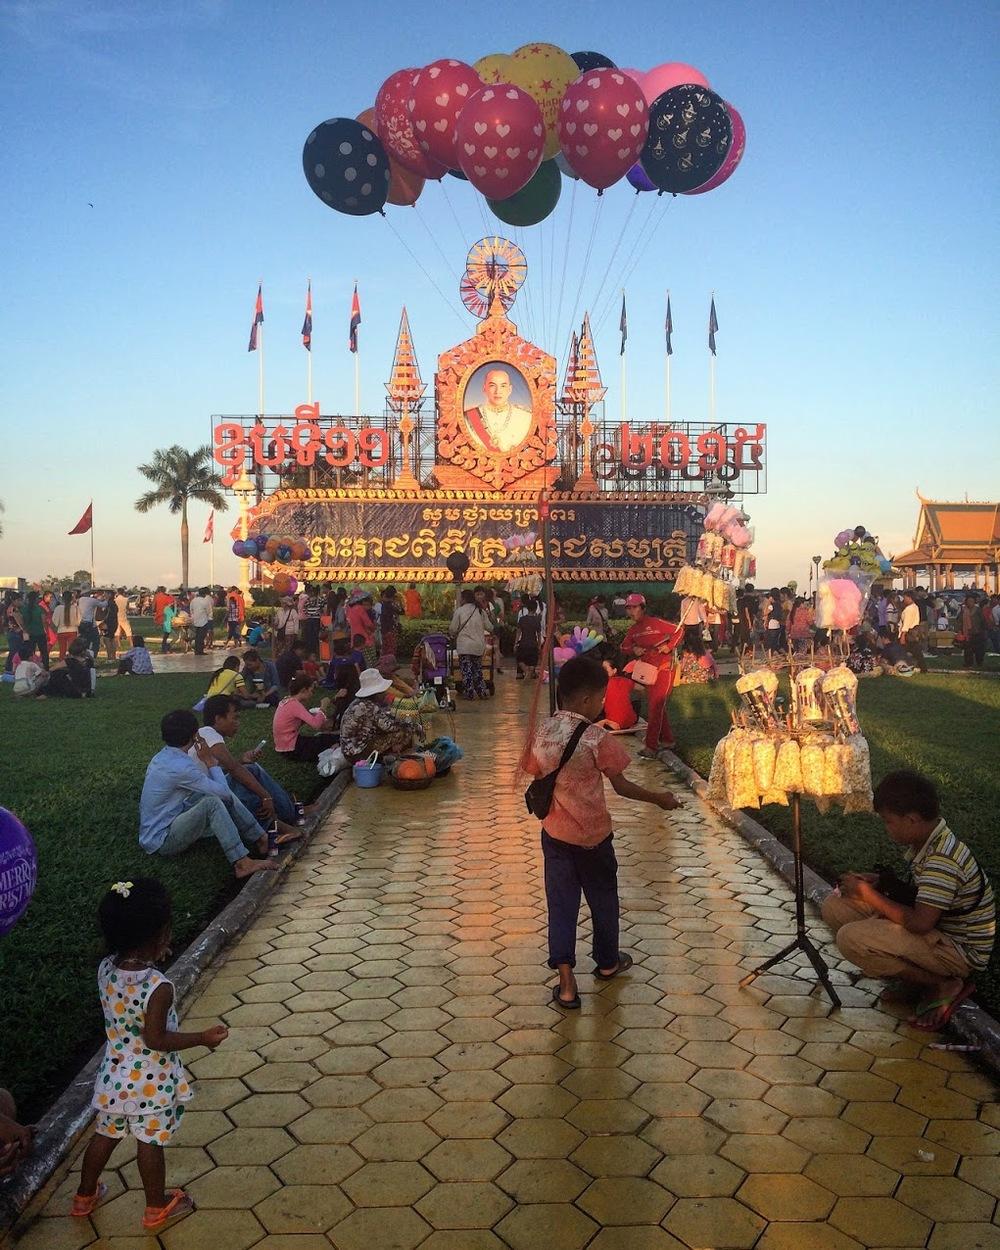 Phnon Phen